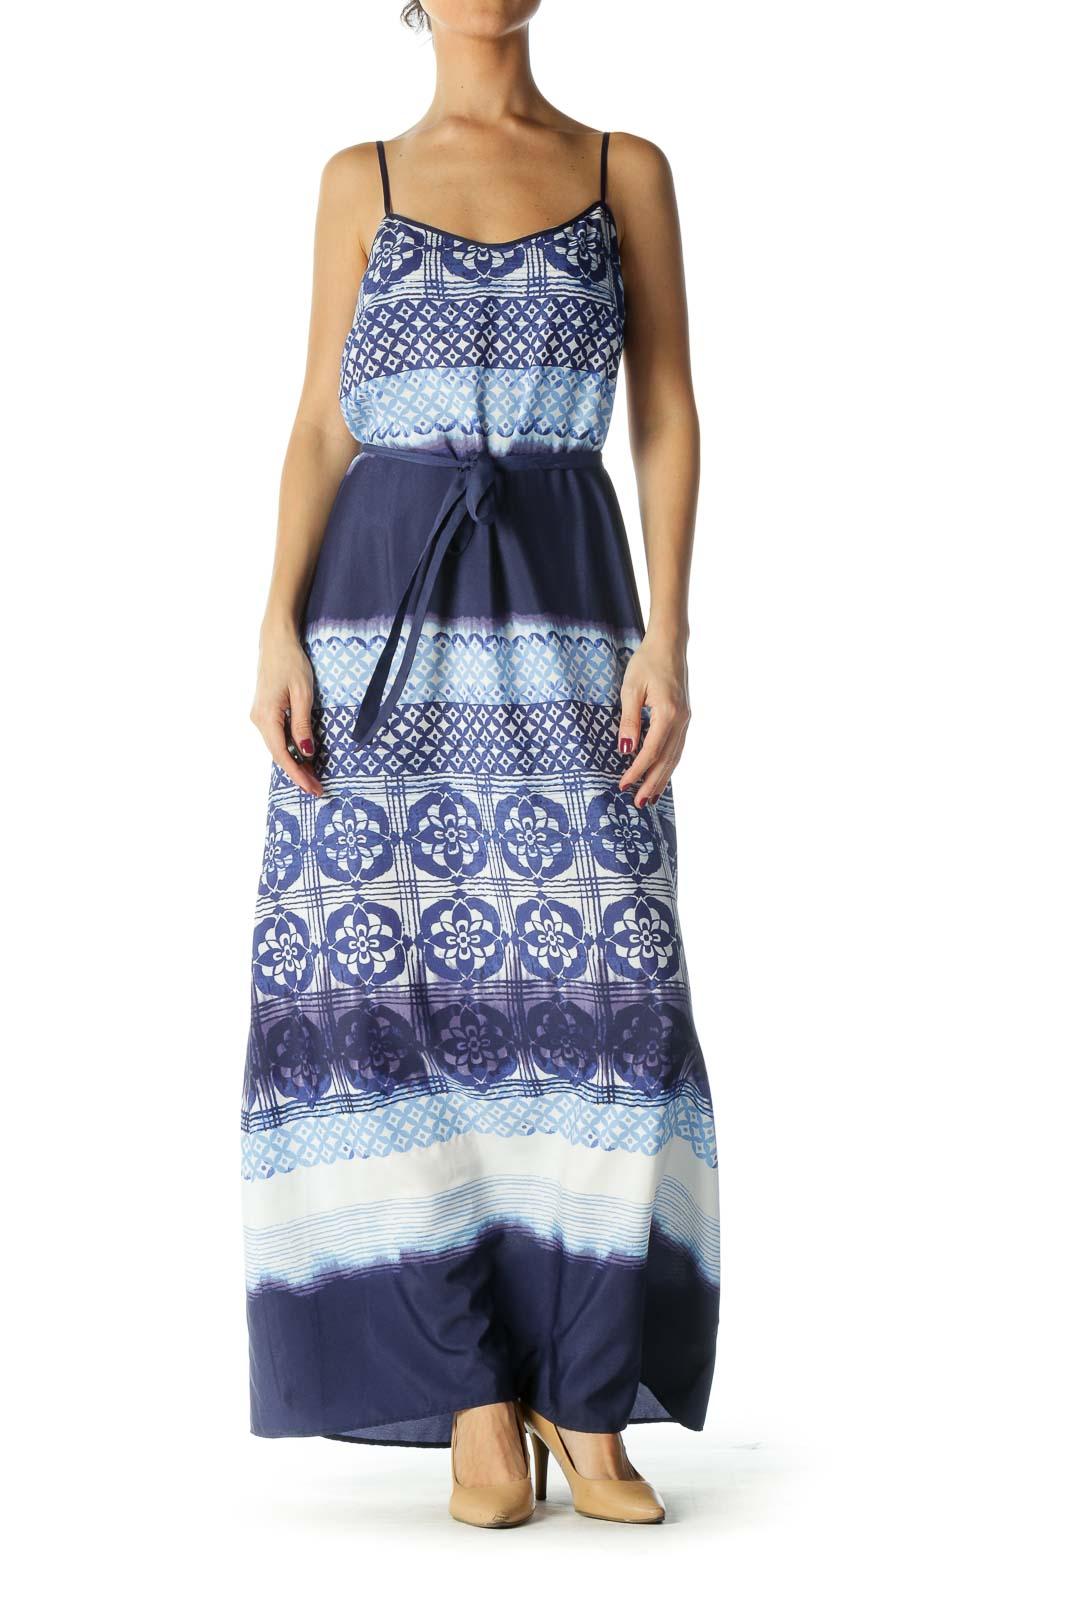 Blue, Navy, Beige Spaghetti Printed Waist Tie Maxi Day Dress